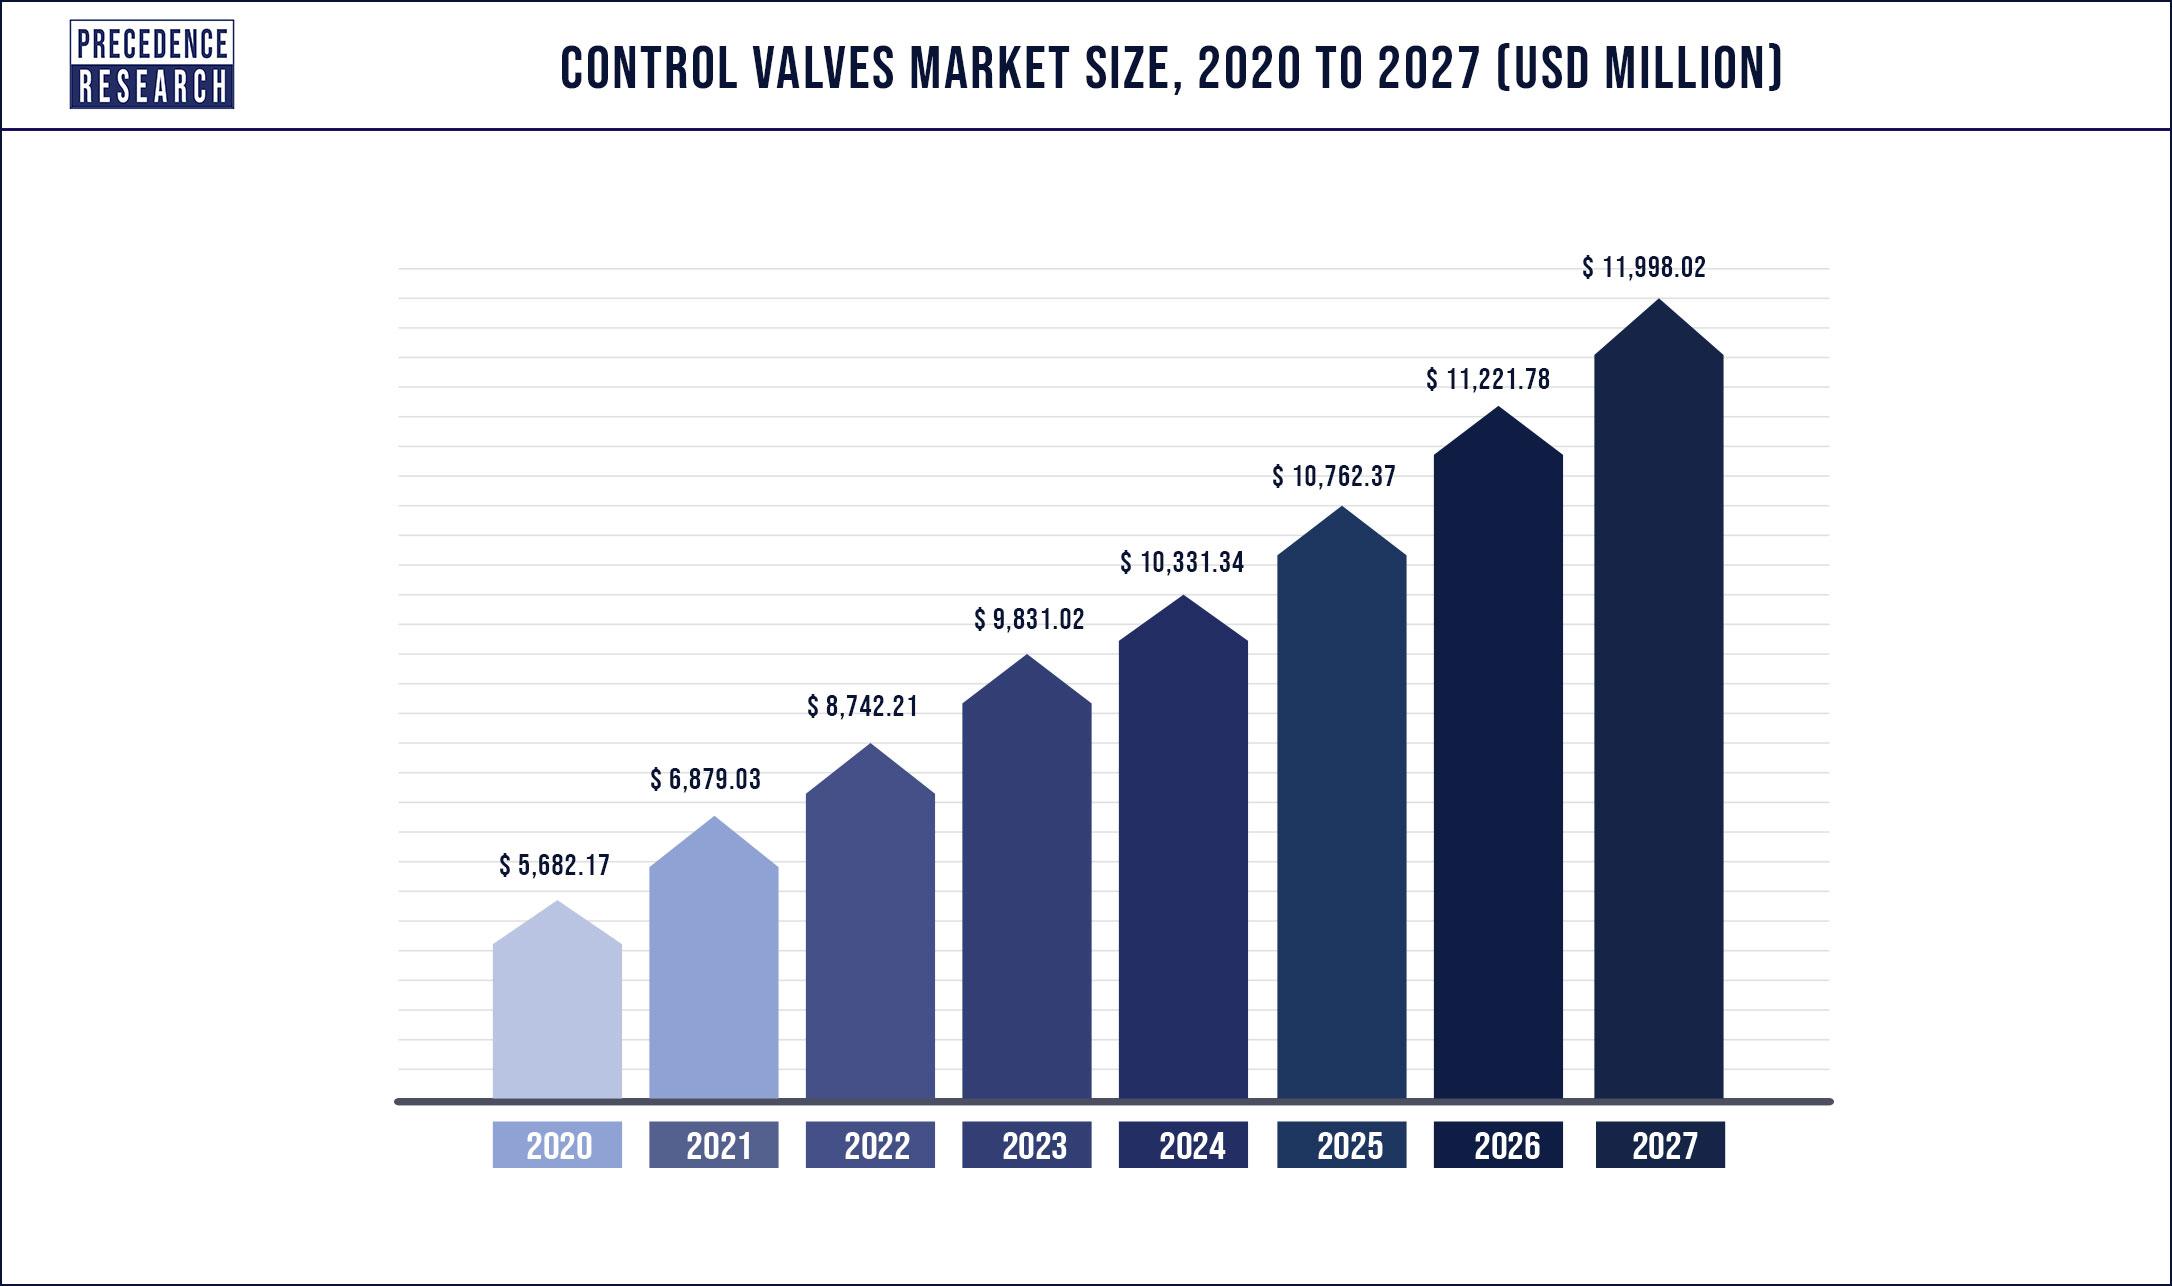 Control Valves Market Size 2020 to 2027